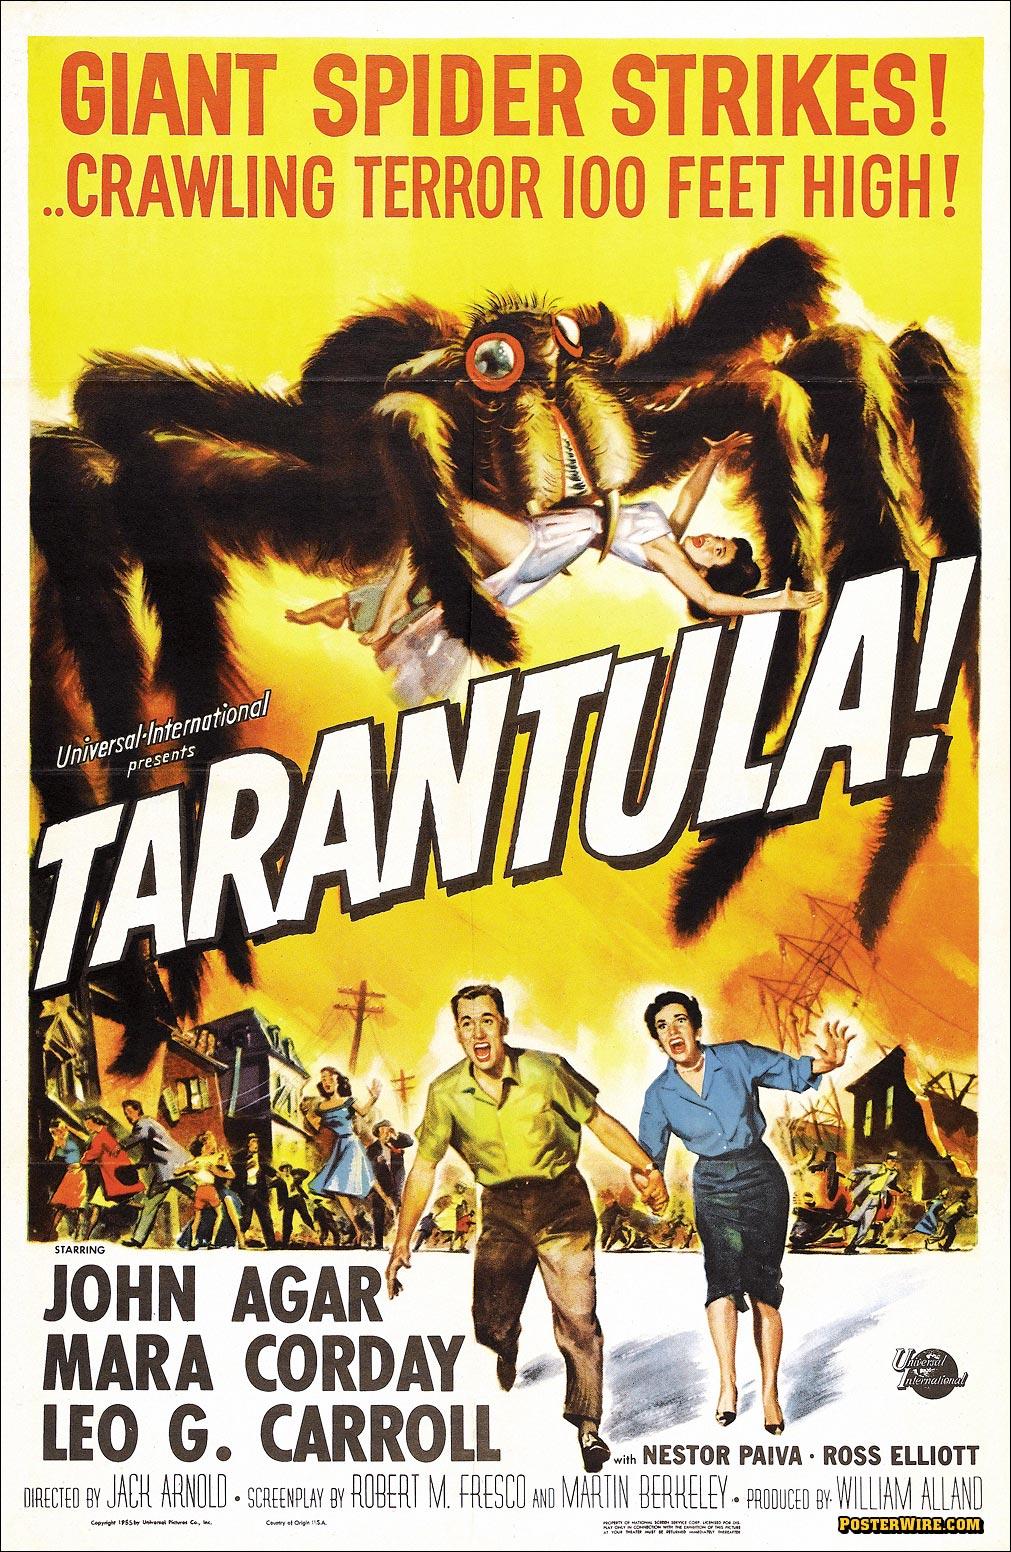 Tarantula movie